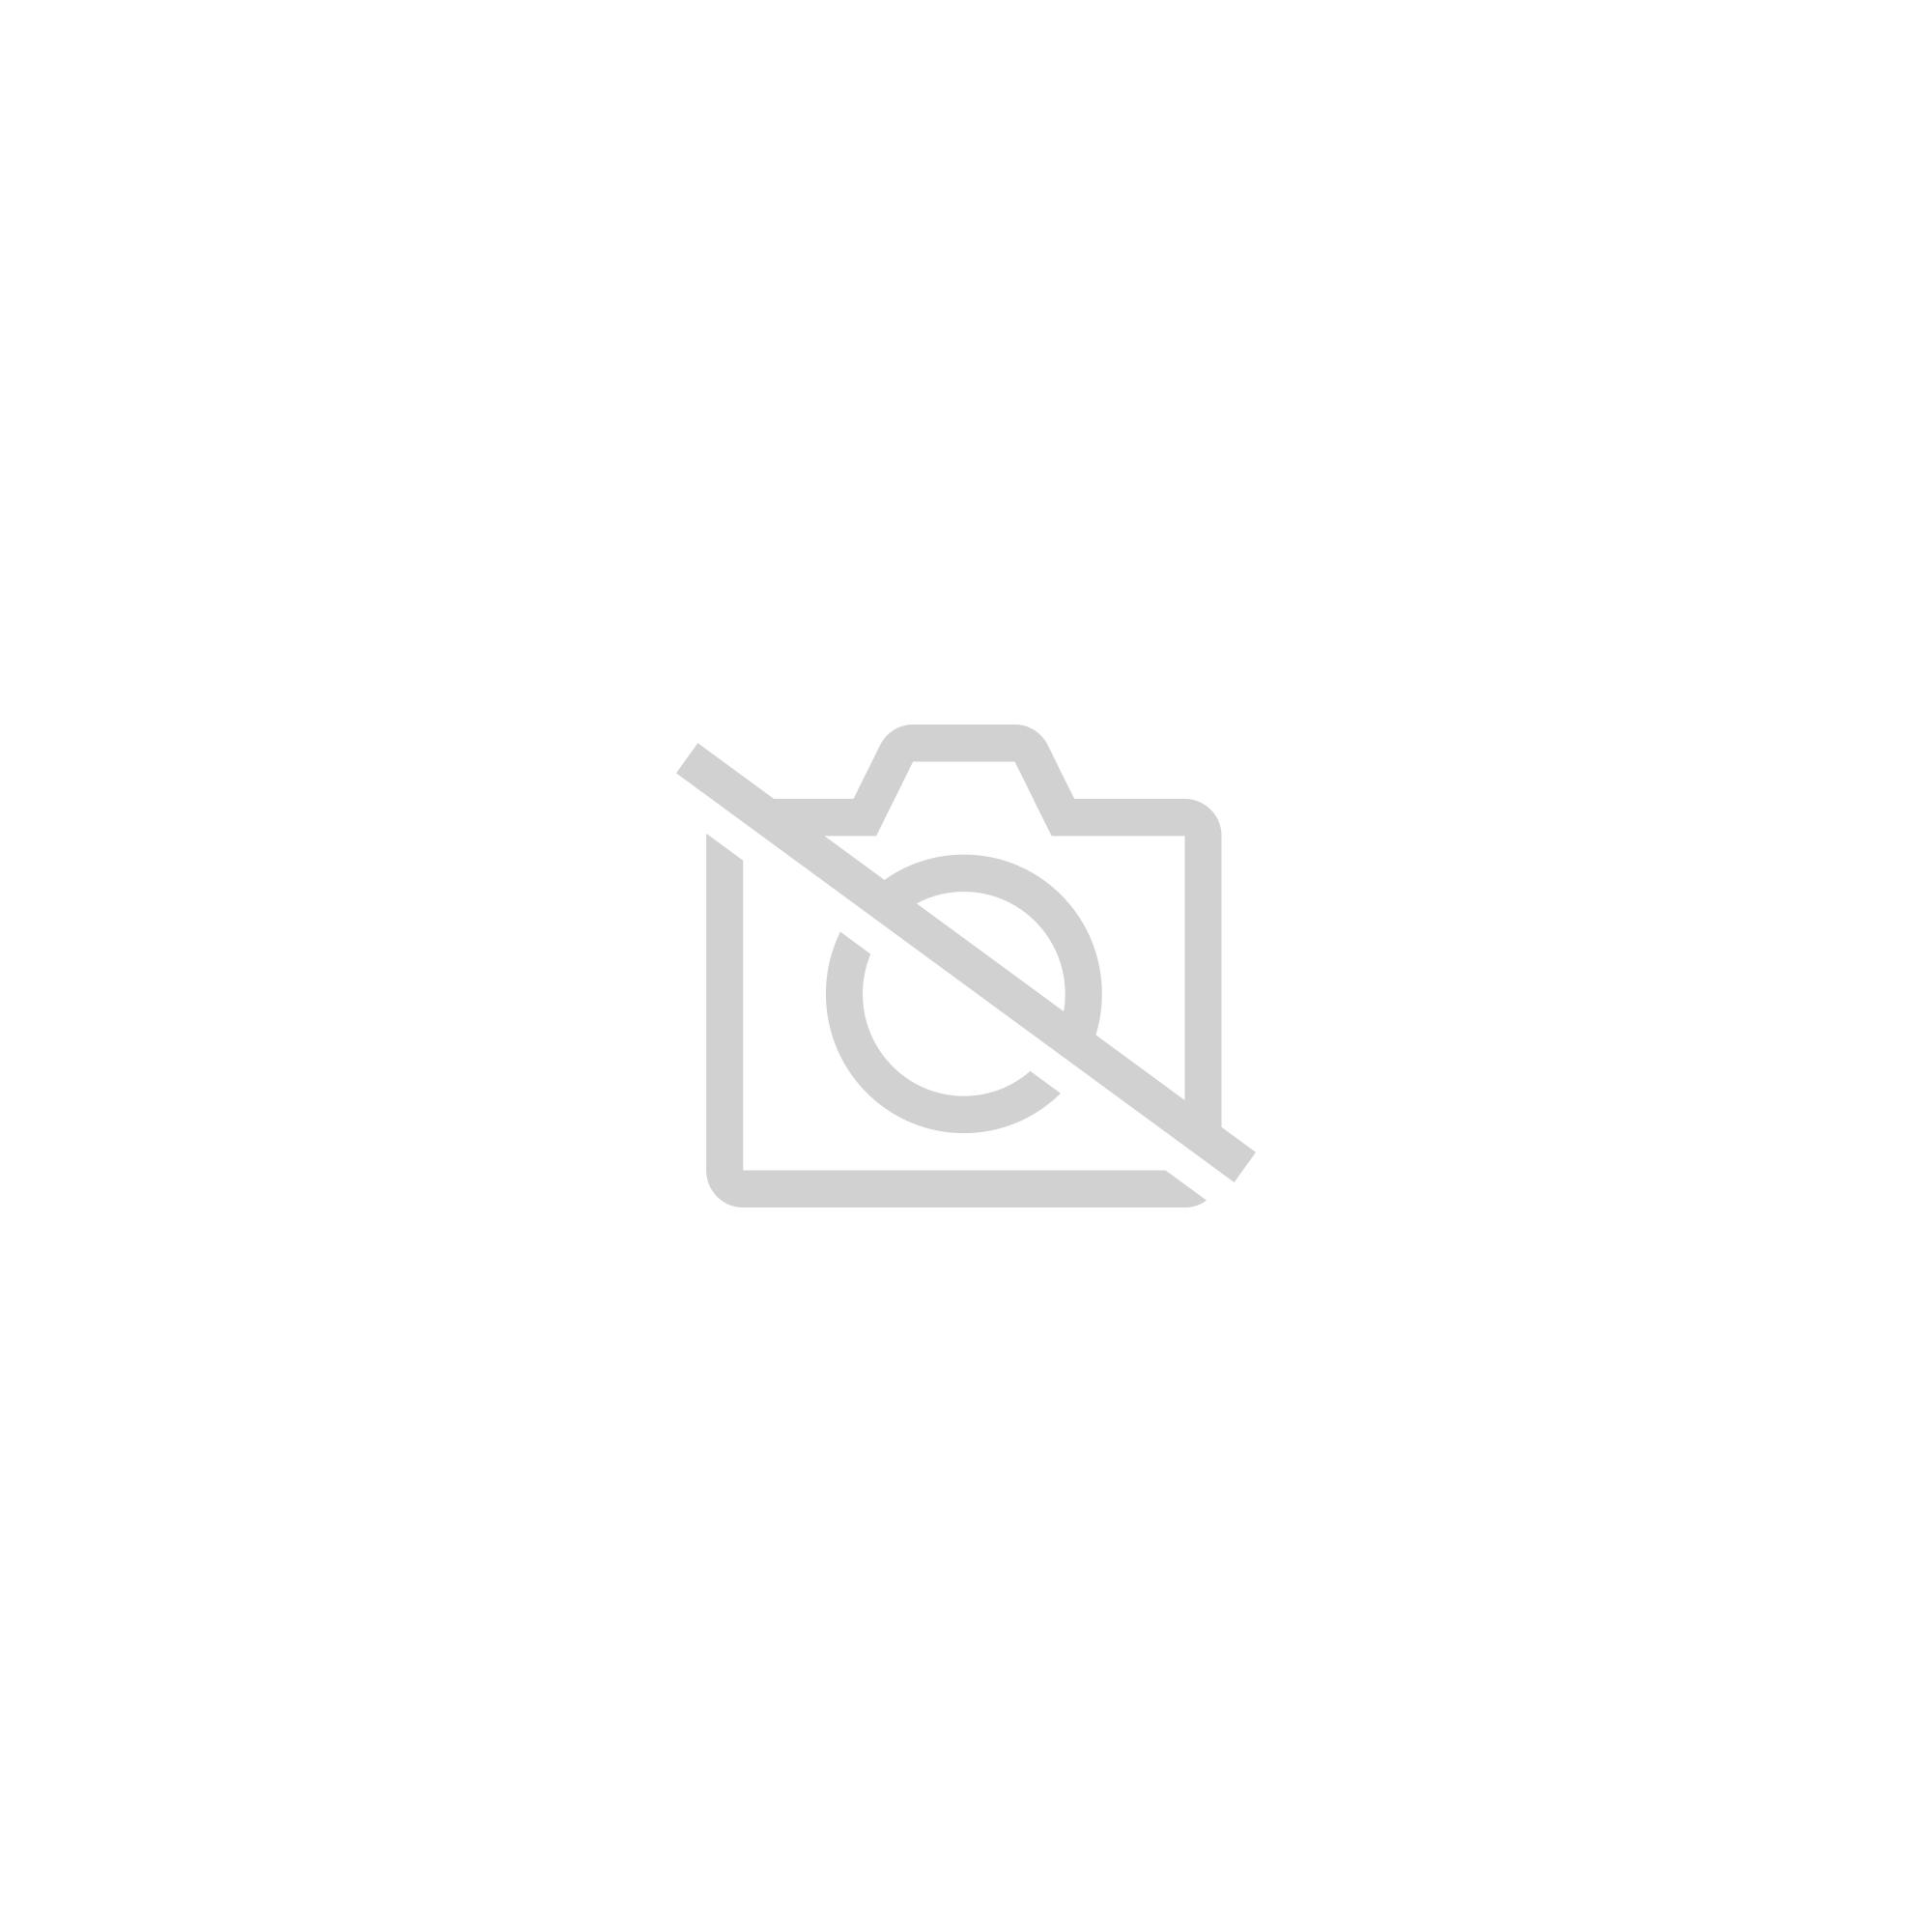 Ecence Samsung Galaxy S6 / S6 Duos Coque De Protection �tui Housse Slim Case Transparente Clear Transparent Dreamcatcher 31020507